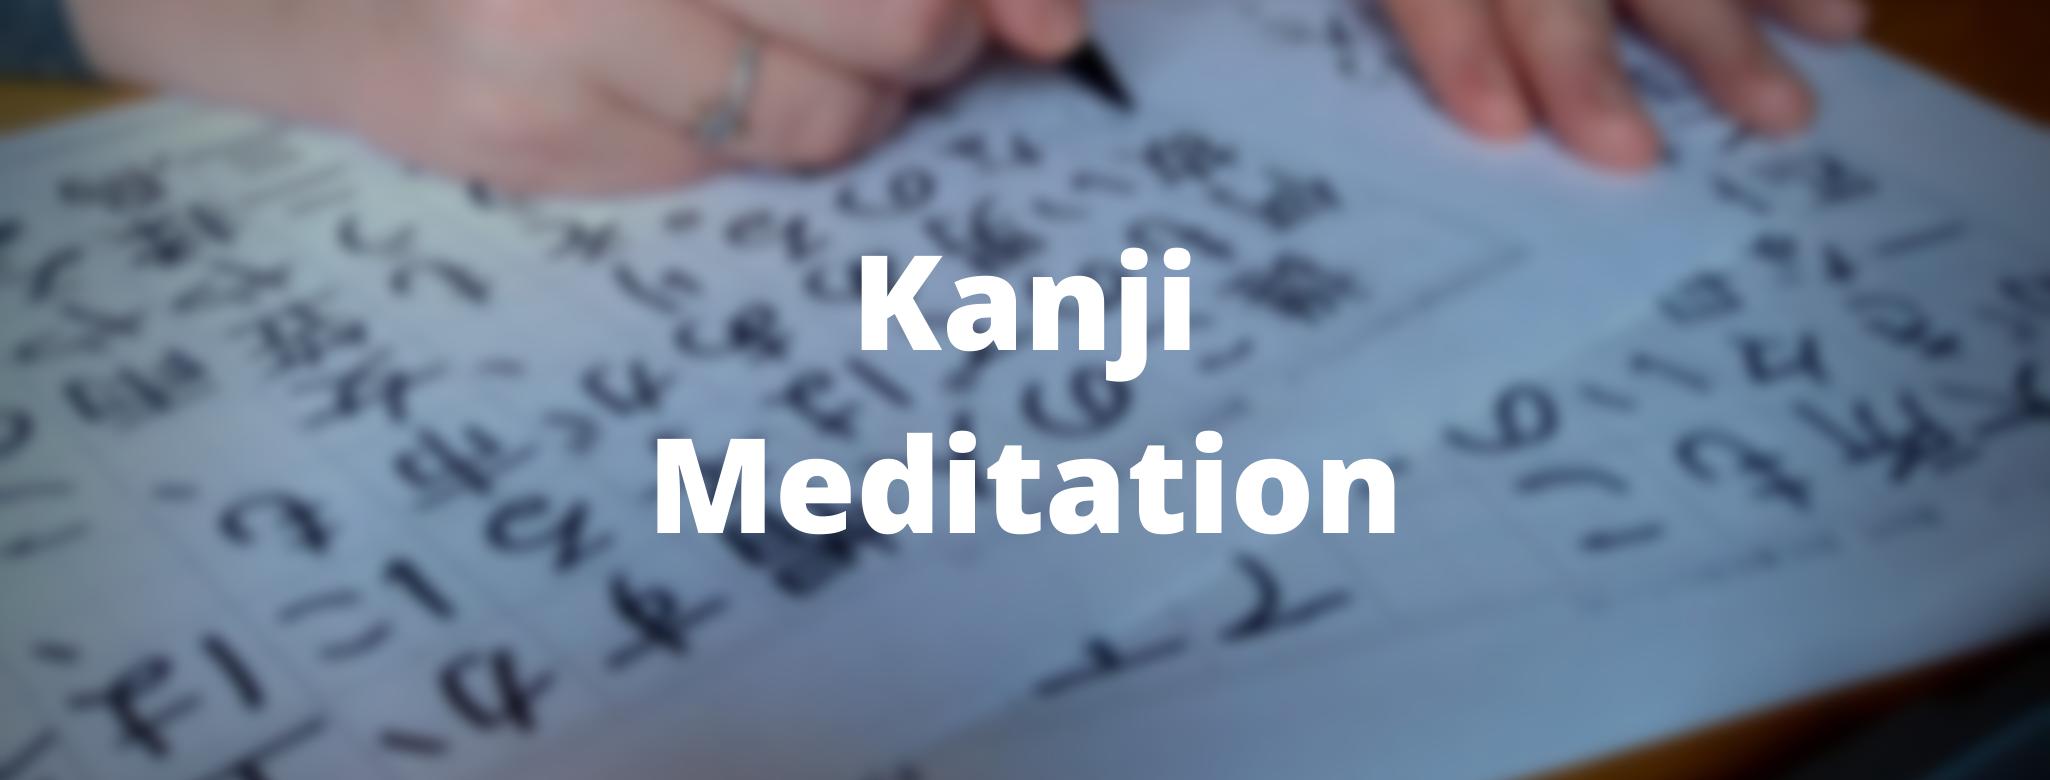 Kanji Meditation class